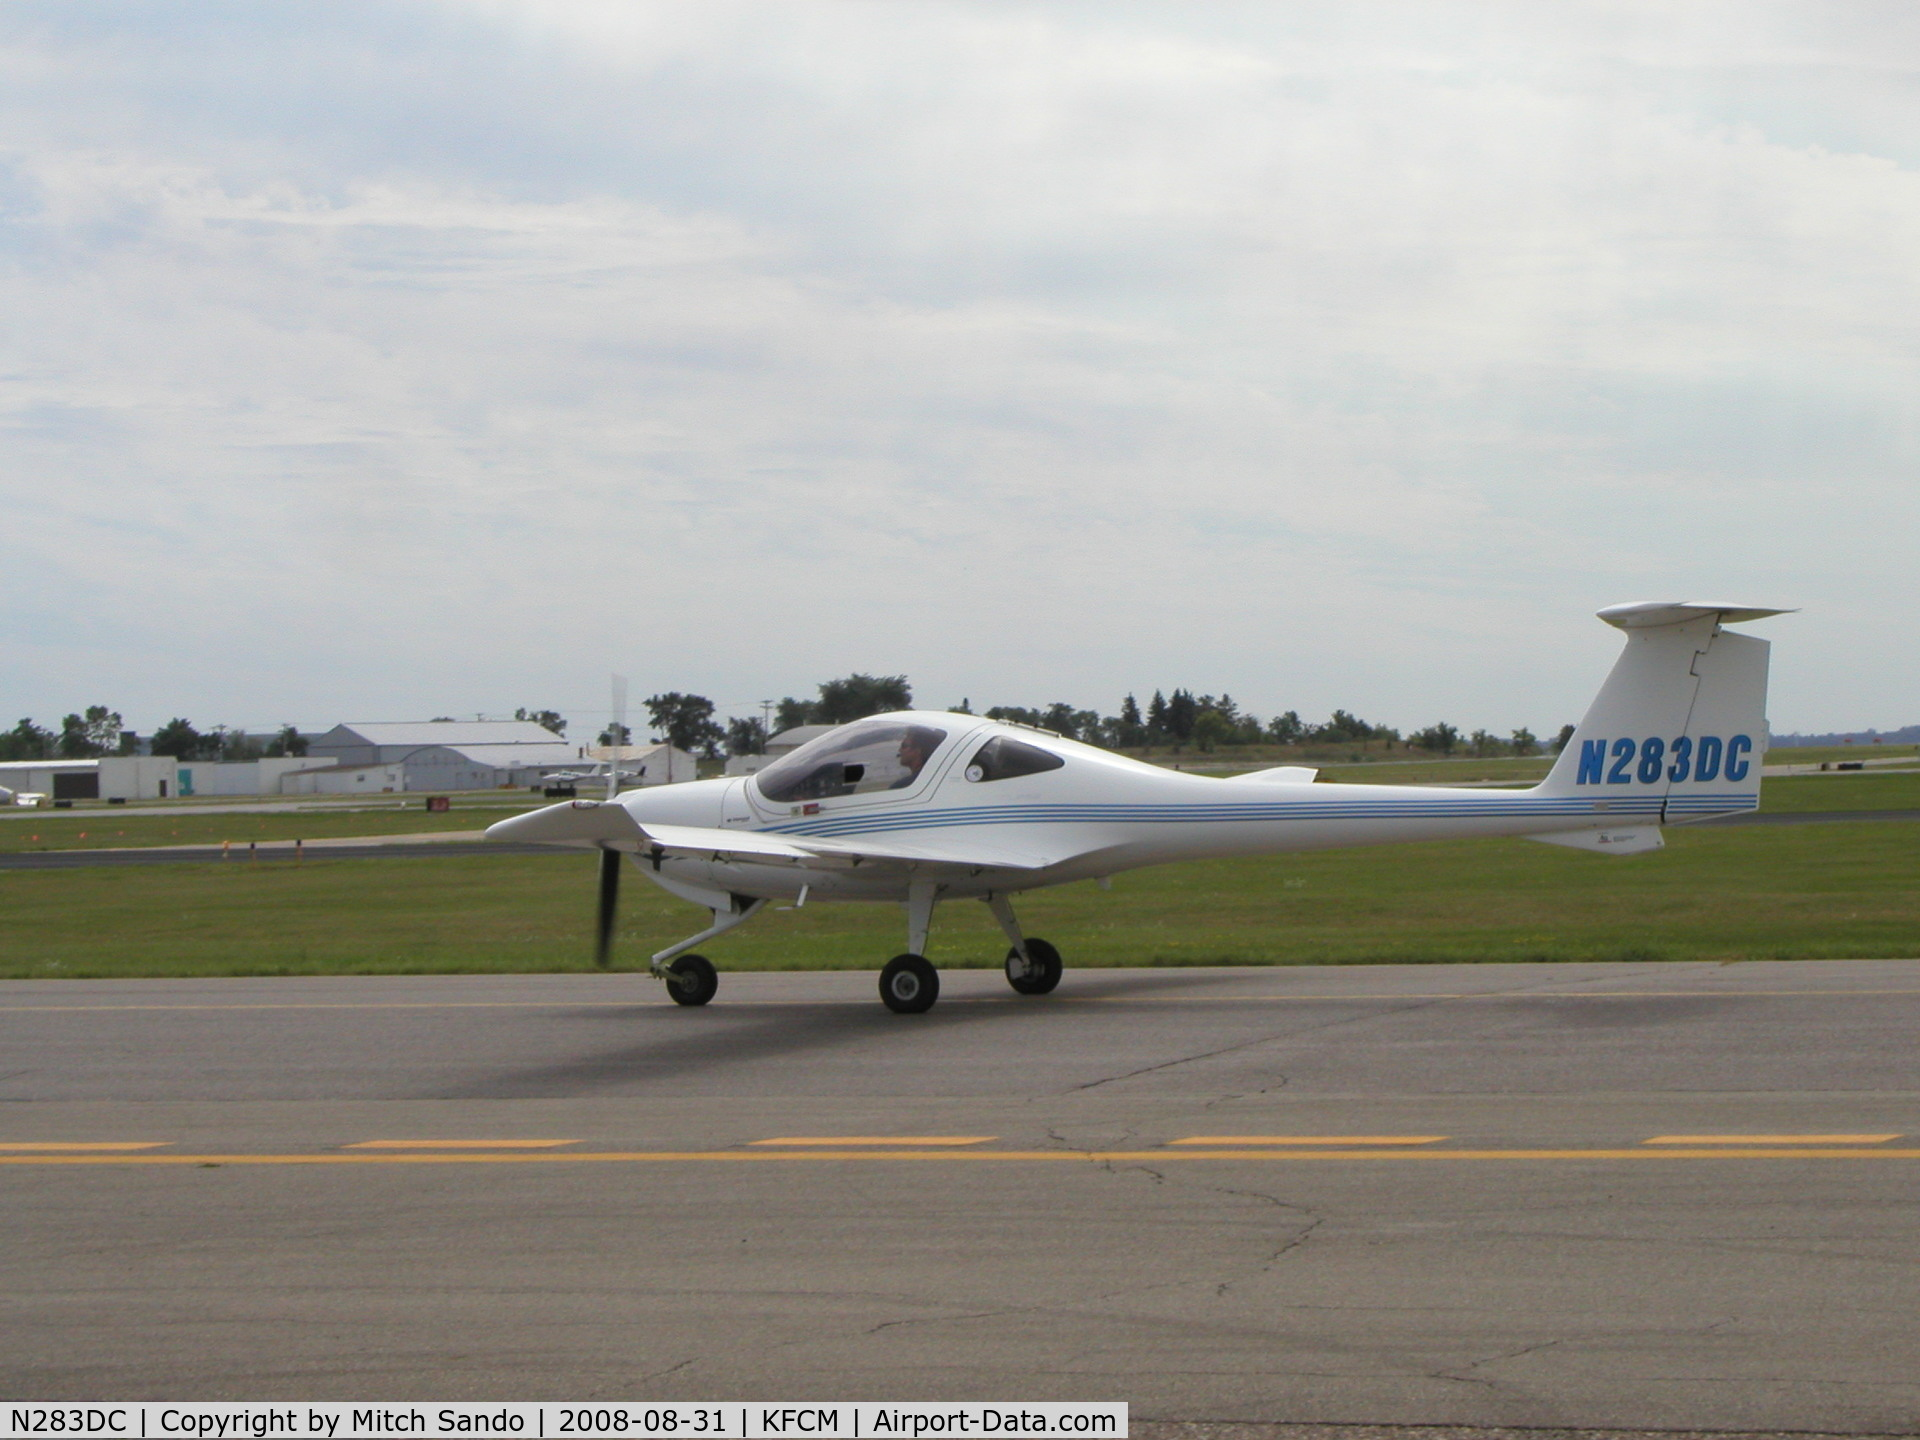 N283DC, 2004 Diamond DA-20C-1 Eclipse C/N C0283, Taxiing to Runway 18.